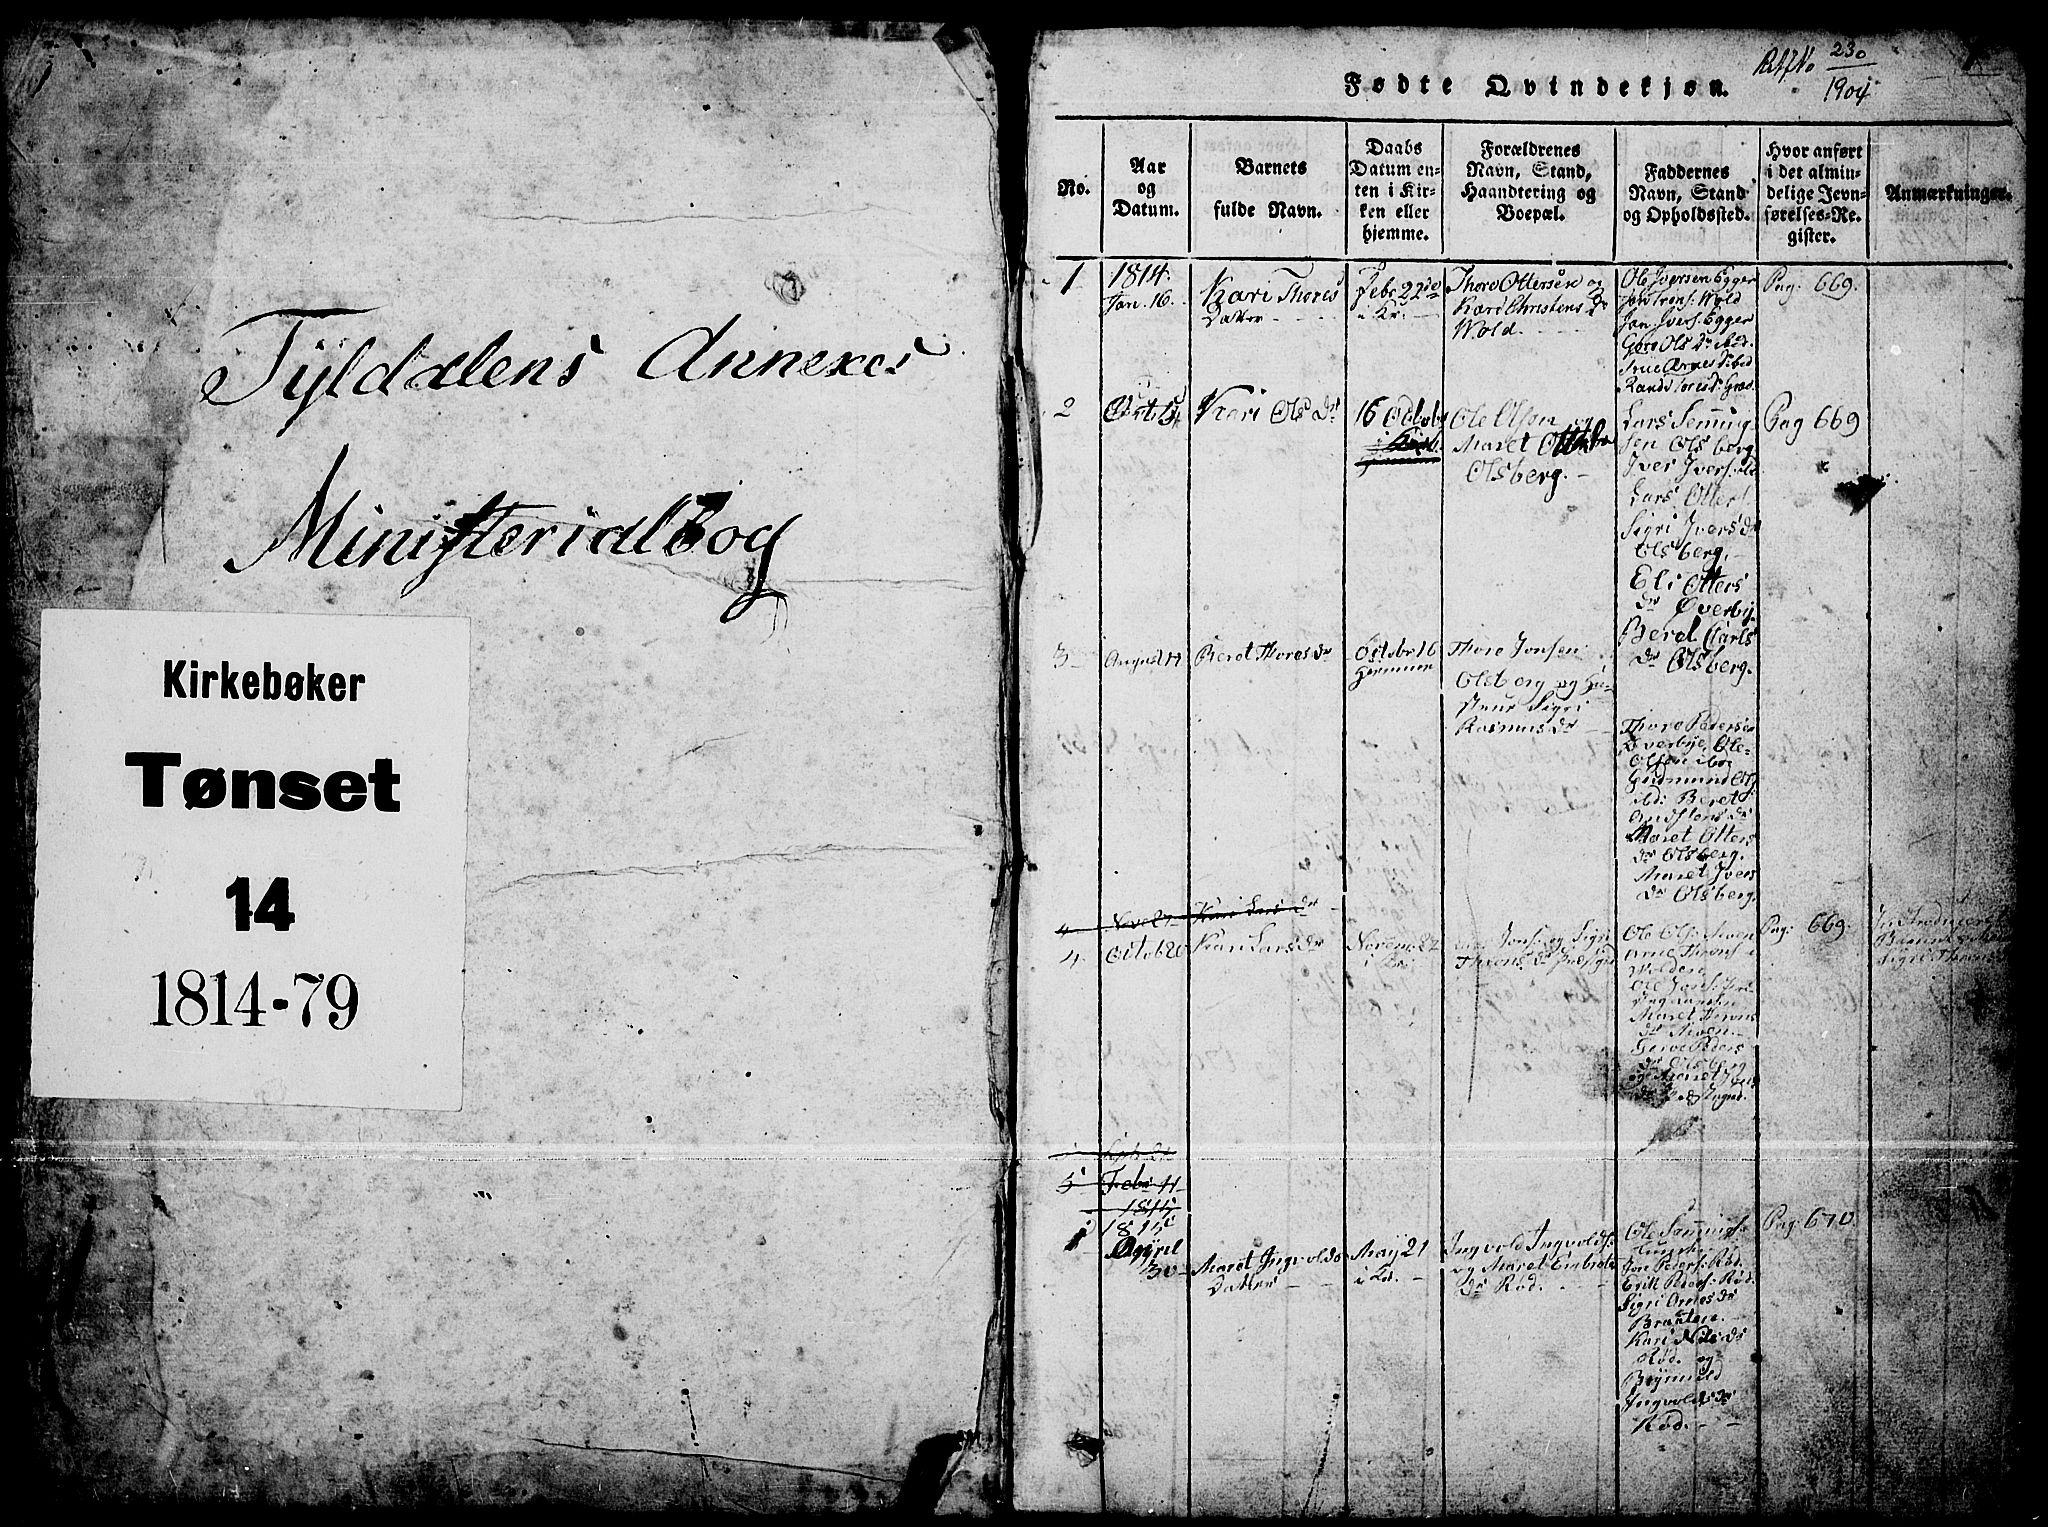 SAH, Tynset prestekontor, Klokkerbok nr. 4, 1814-1879, s. 0-1